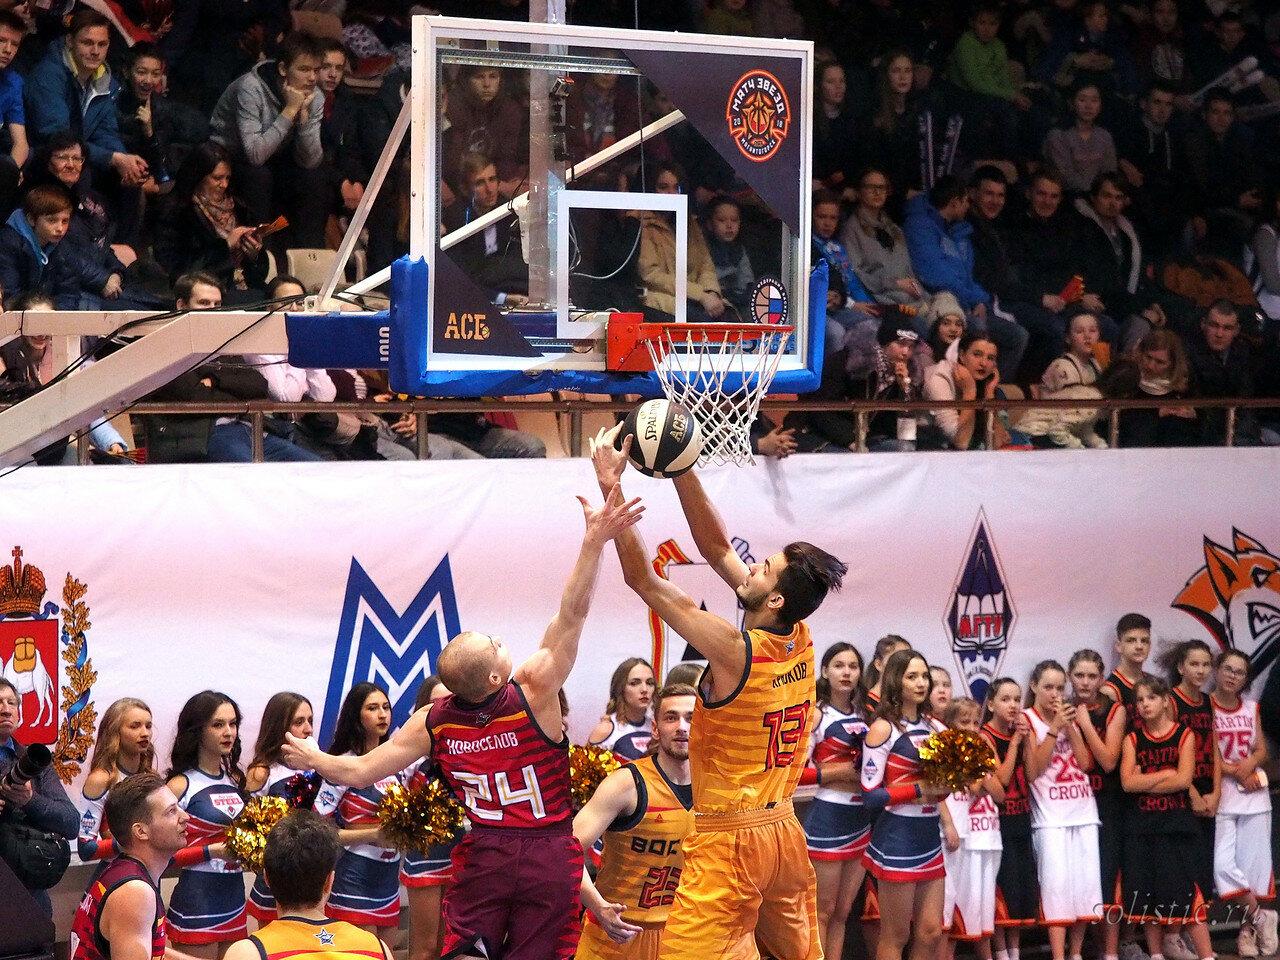 61 Матч звезд АСБ 2018 (ассоциации студенческого баскетбола)